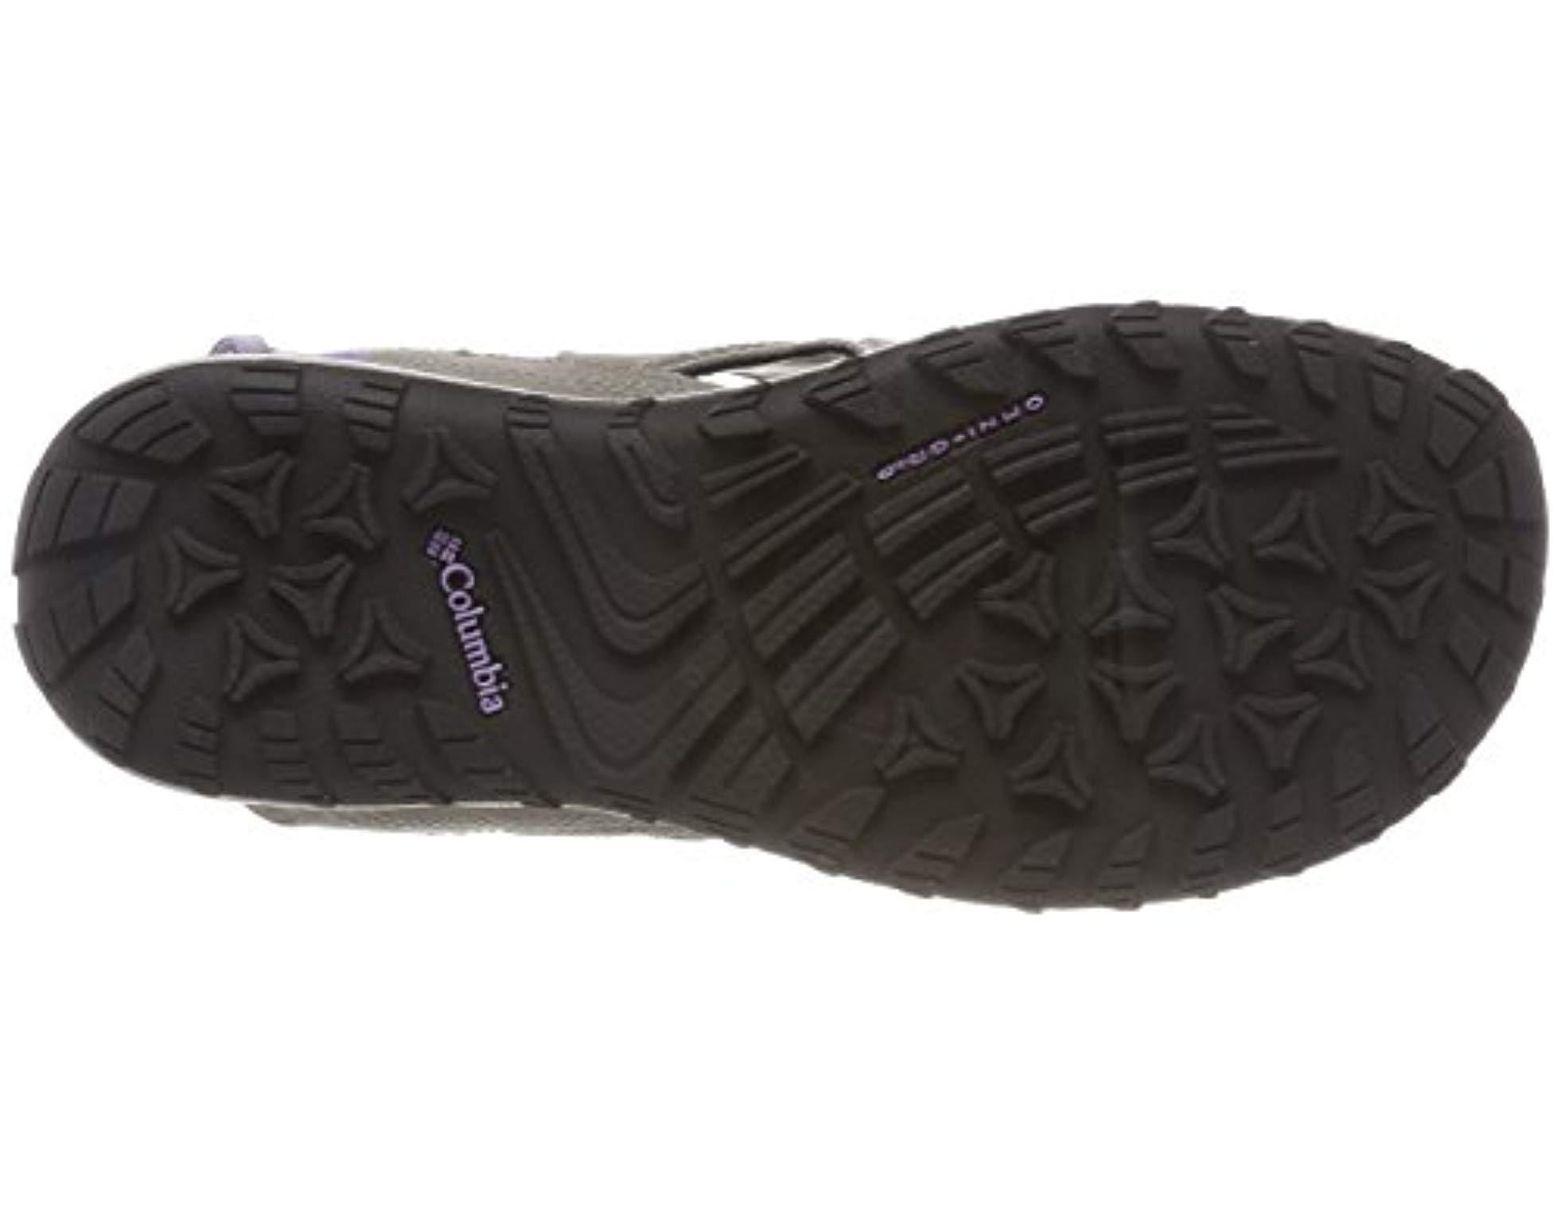 Hiking Sandals Wrap Women's Santiam 9d2hie 5jL3RA4